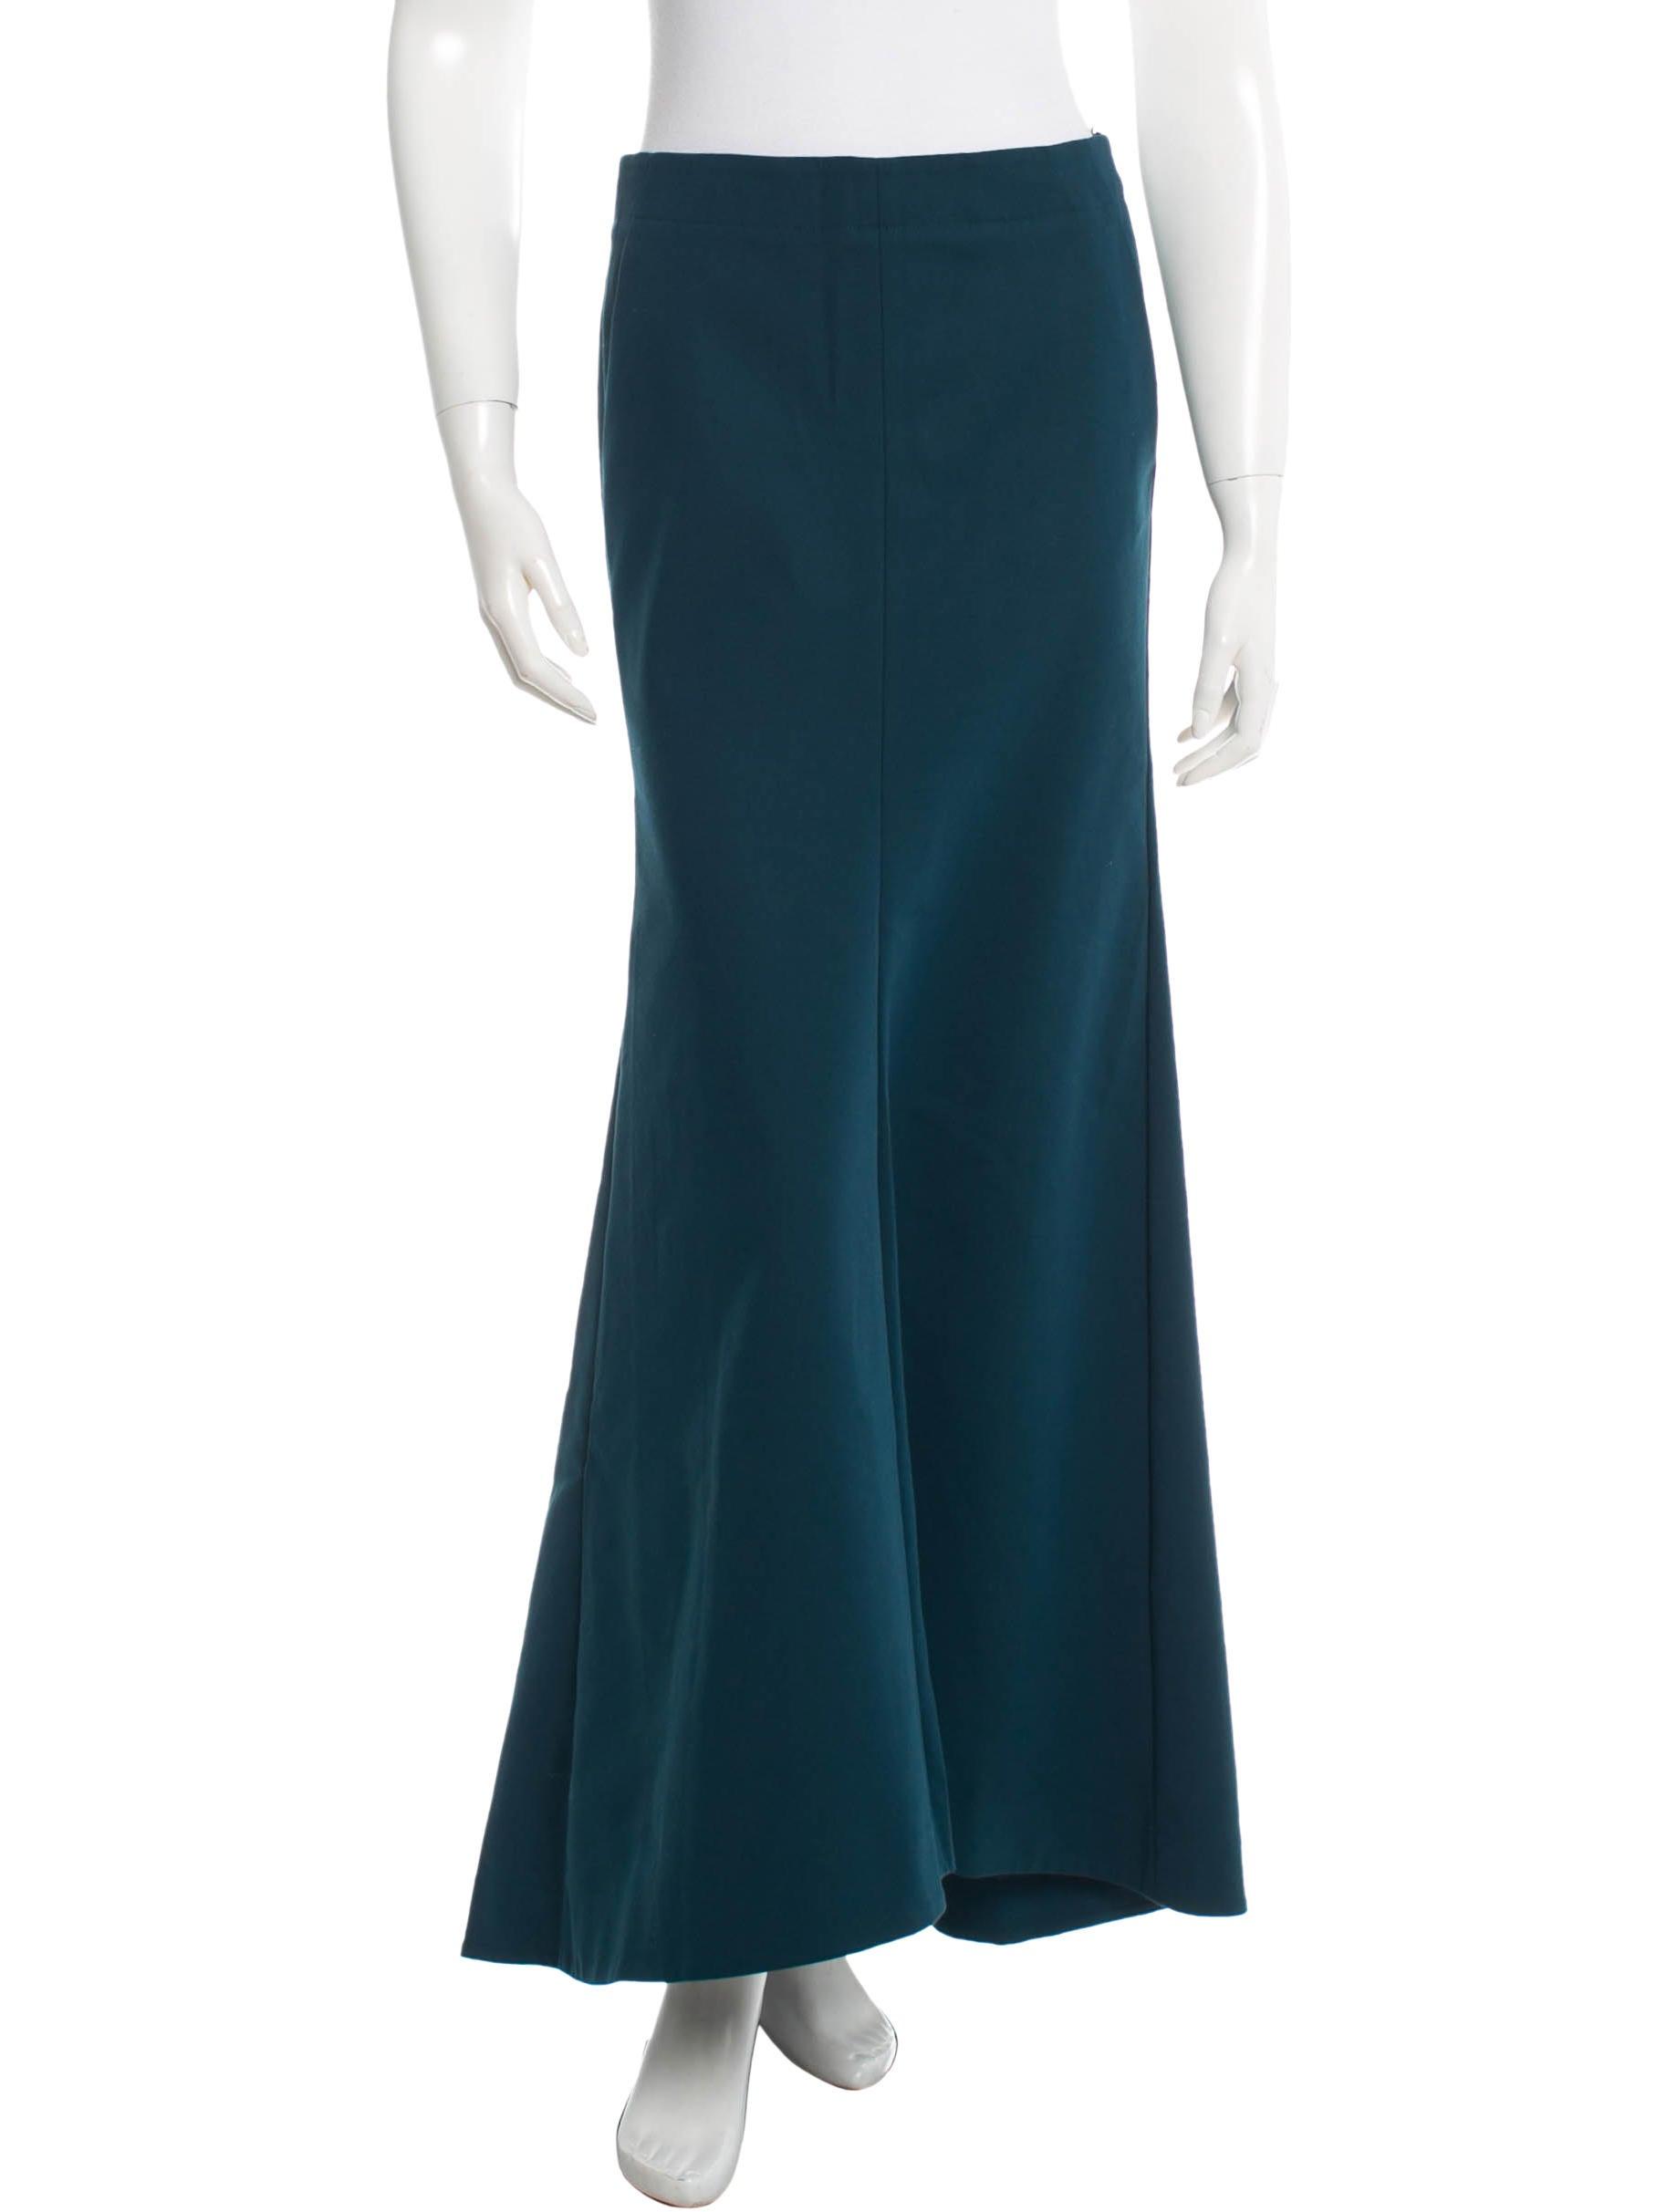 tibi teal maxi skirt skirts wti27549 the realreal